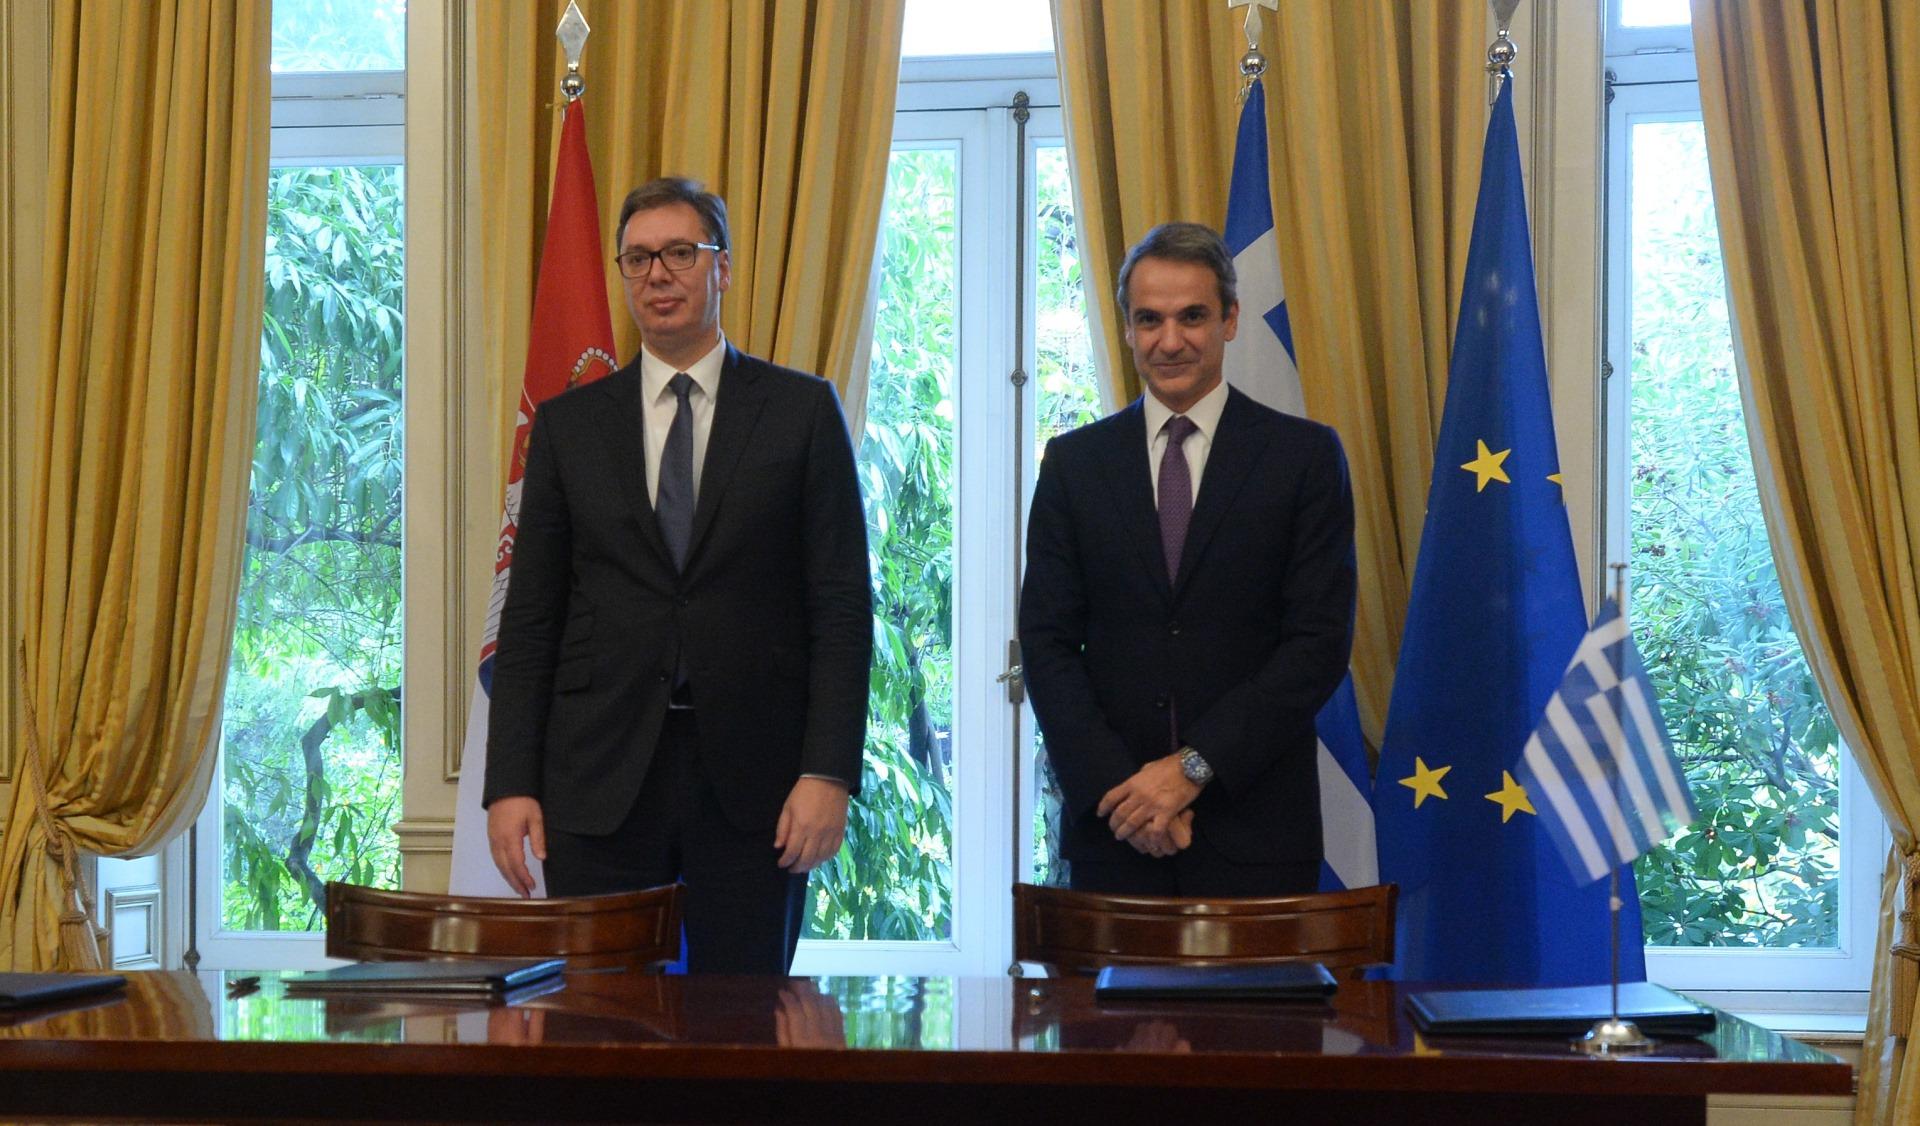 Predsednik Srbije Aleksandar Vucic sa grčkim premijerom Kirjakosom Micotakisom 1